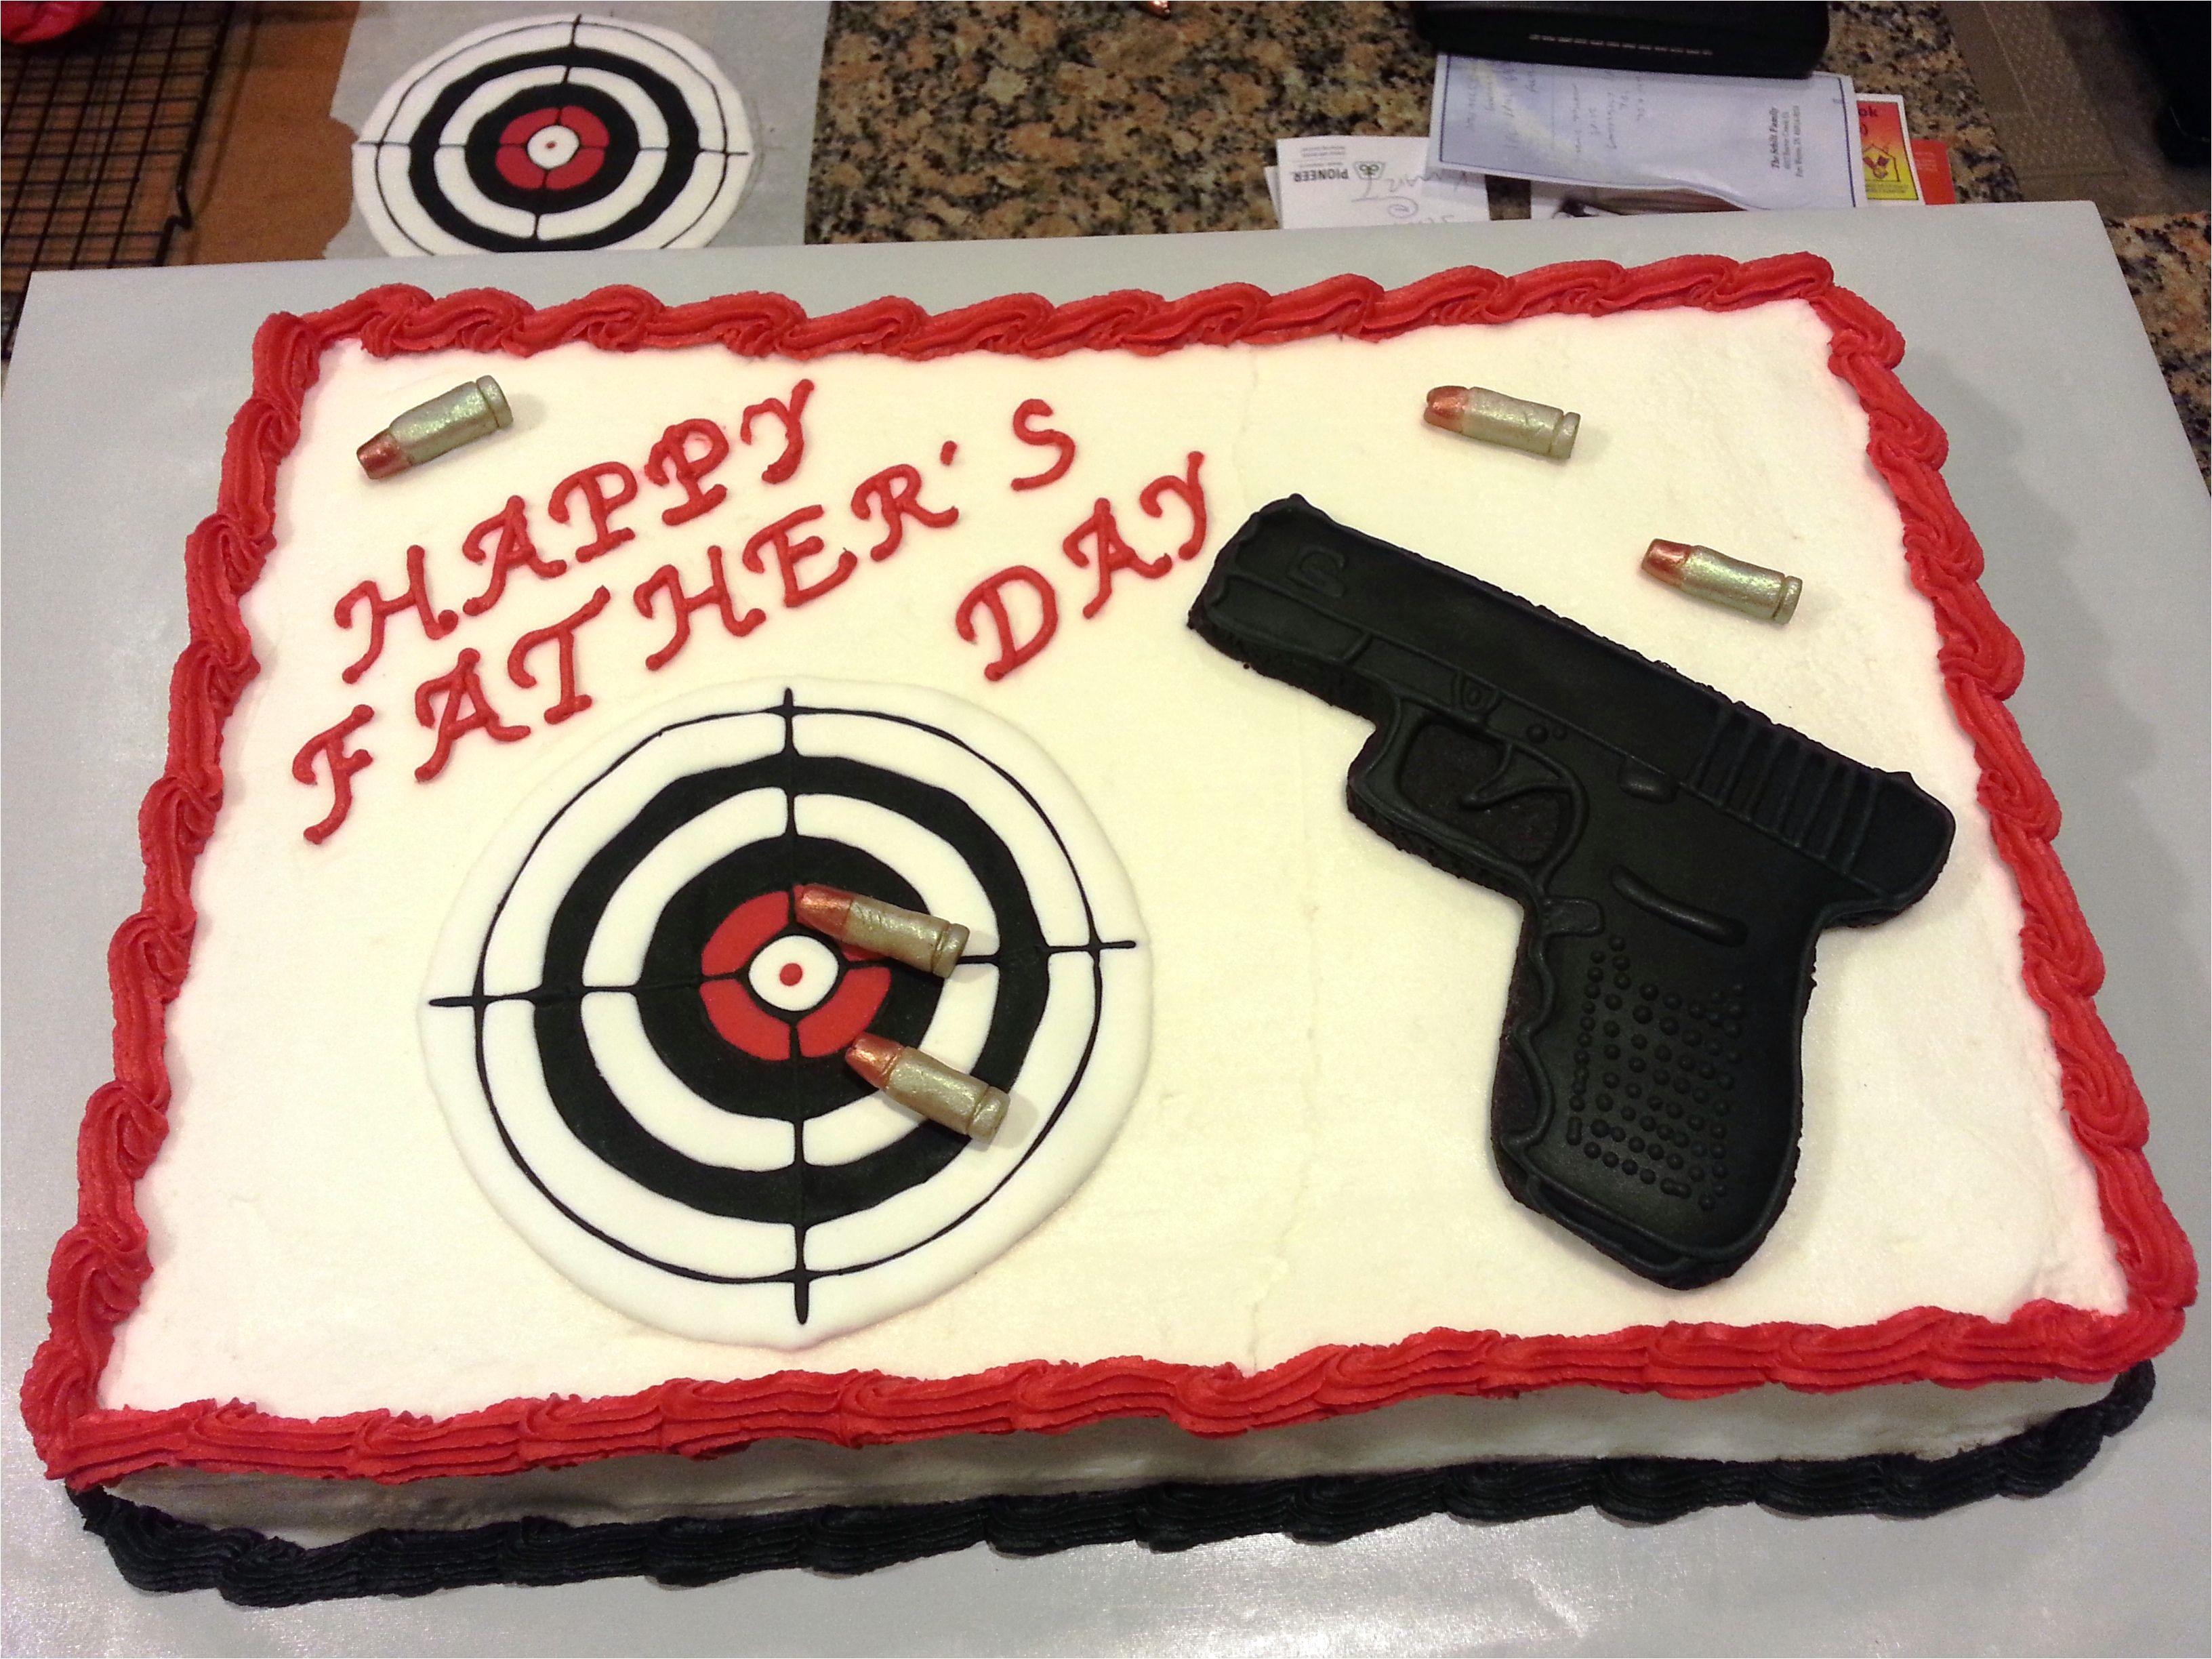 Target Birthday Cake Decorations Gun Cake Gun Is A Sugar Cookie